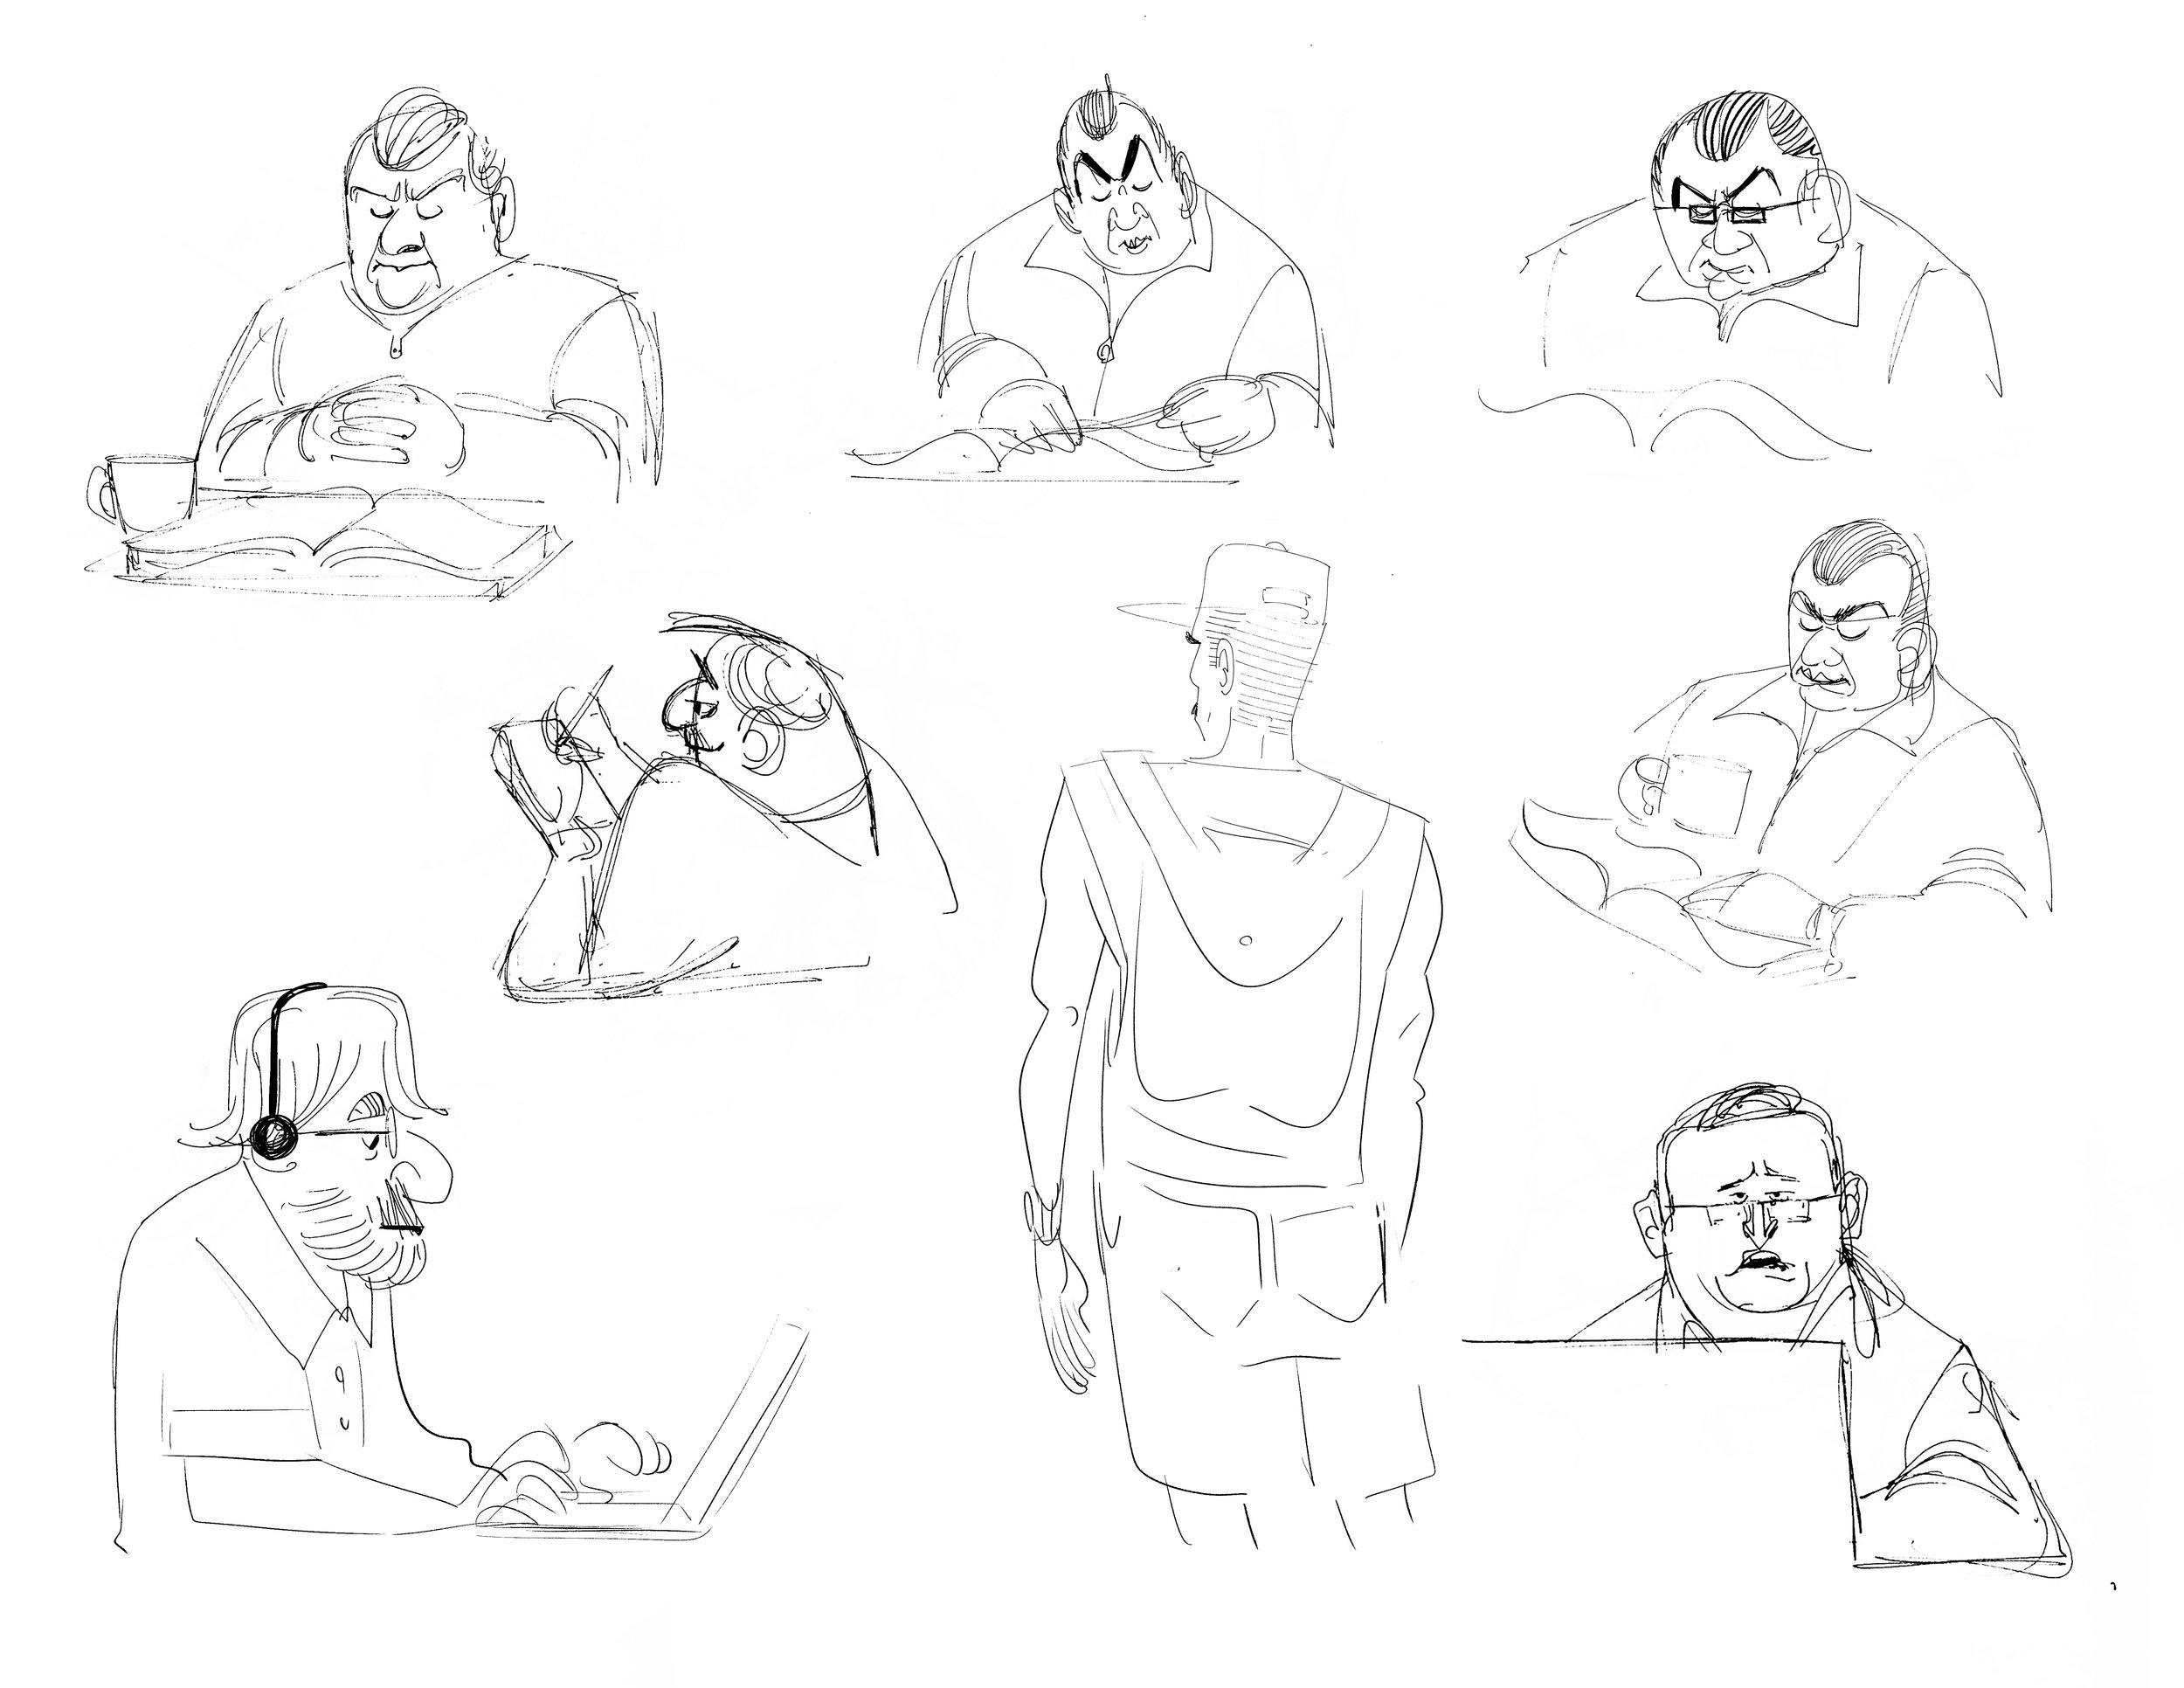 sketches_4.jpg